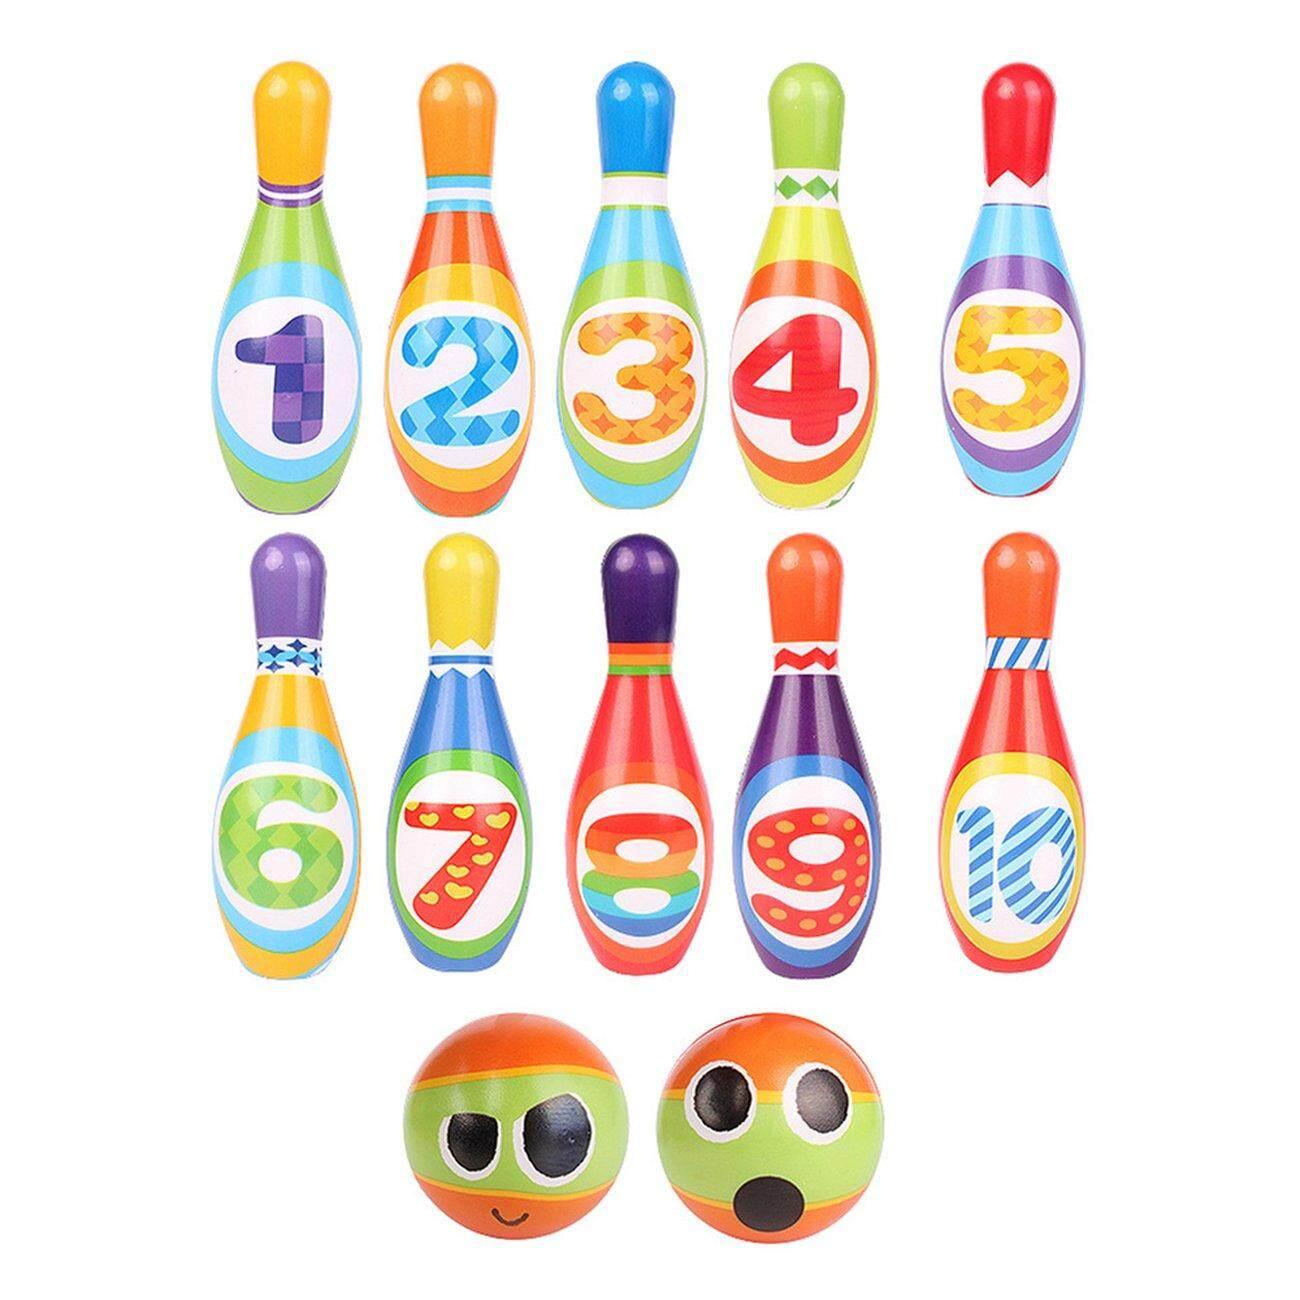 Hot Deals 8pcs 12pcs Environmental Protection Children's Sports Toys Pu Bowling Set